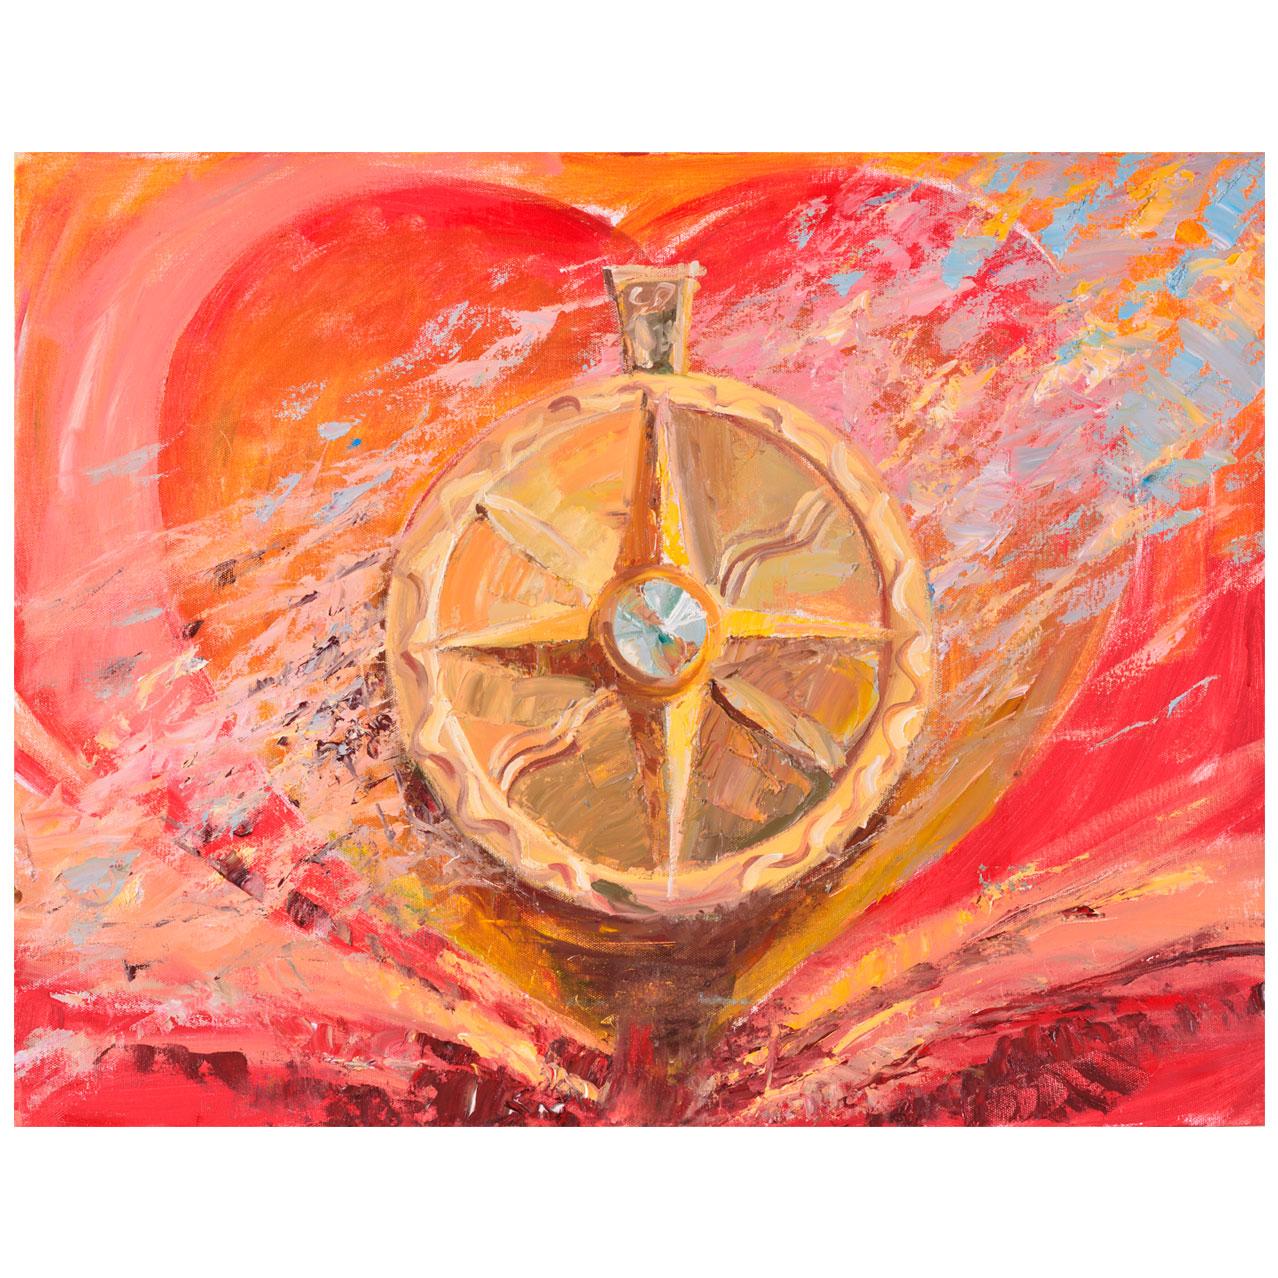 Картина Мехди Эбрагими Вафа «Сила мудрости». Галерея искусств «Жуковка Арт»